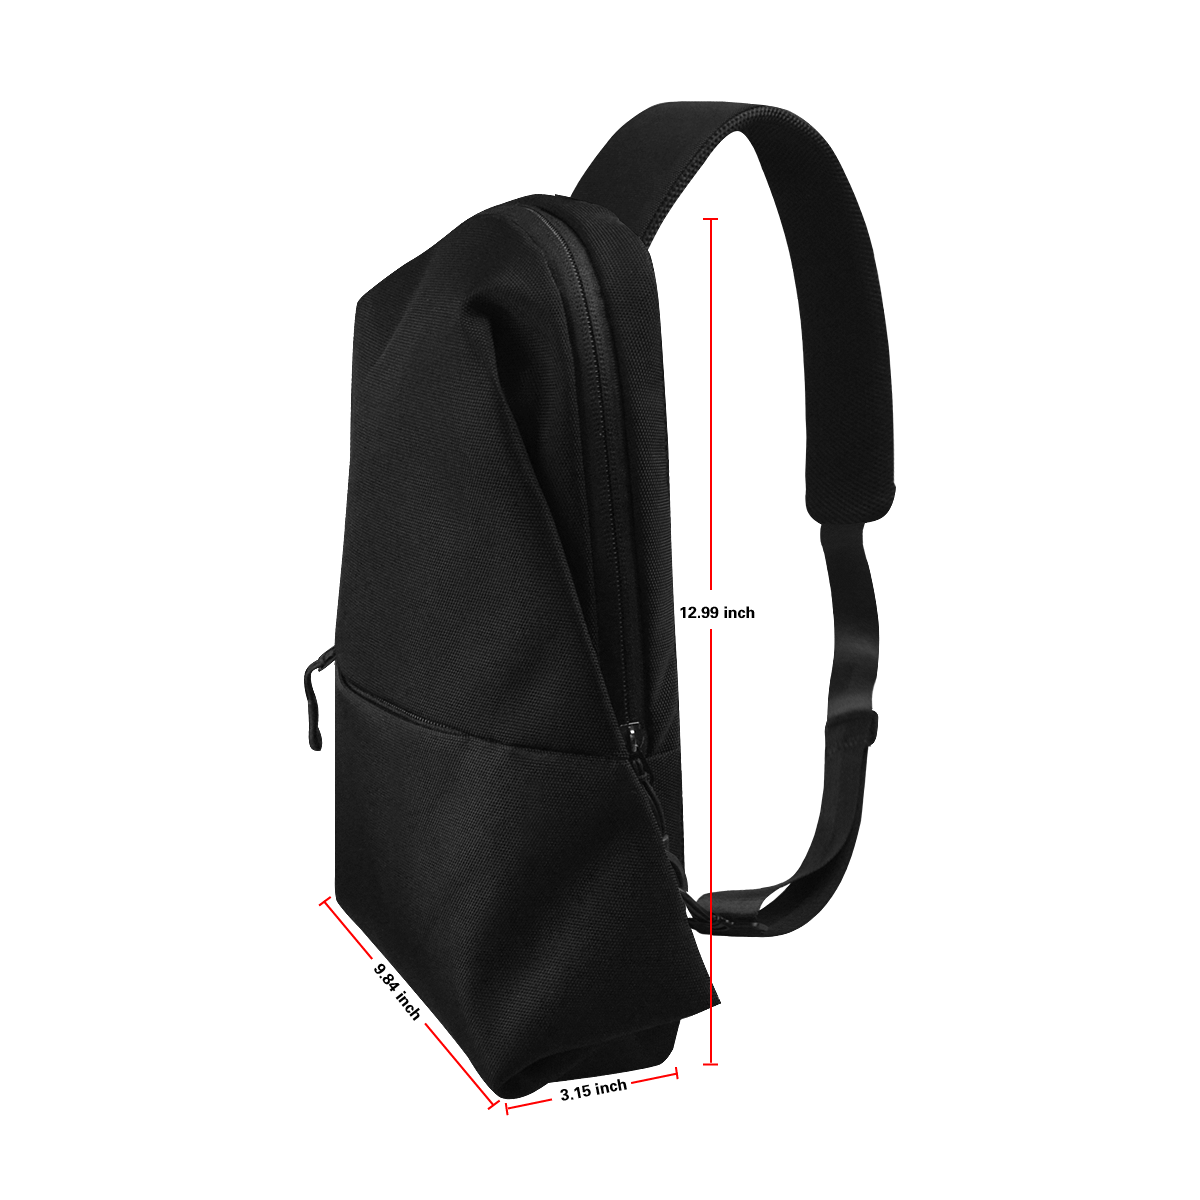 Image of Hustle Memory Raider Chest Bag